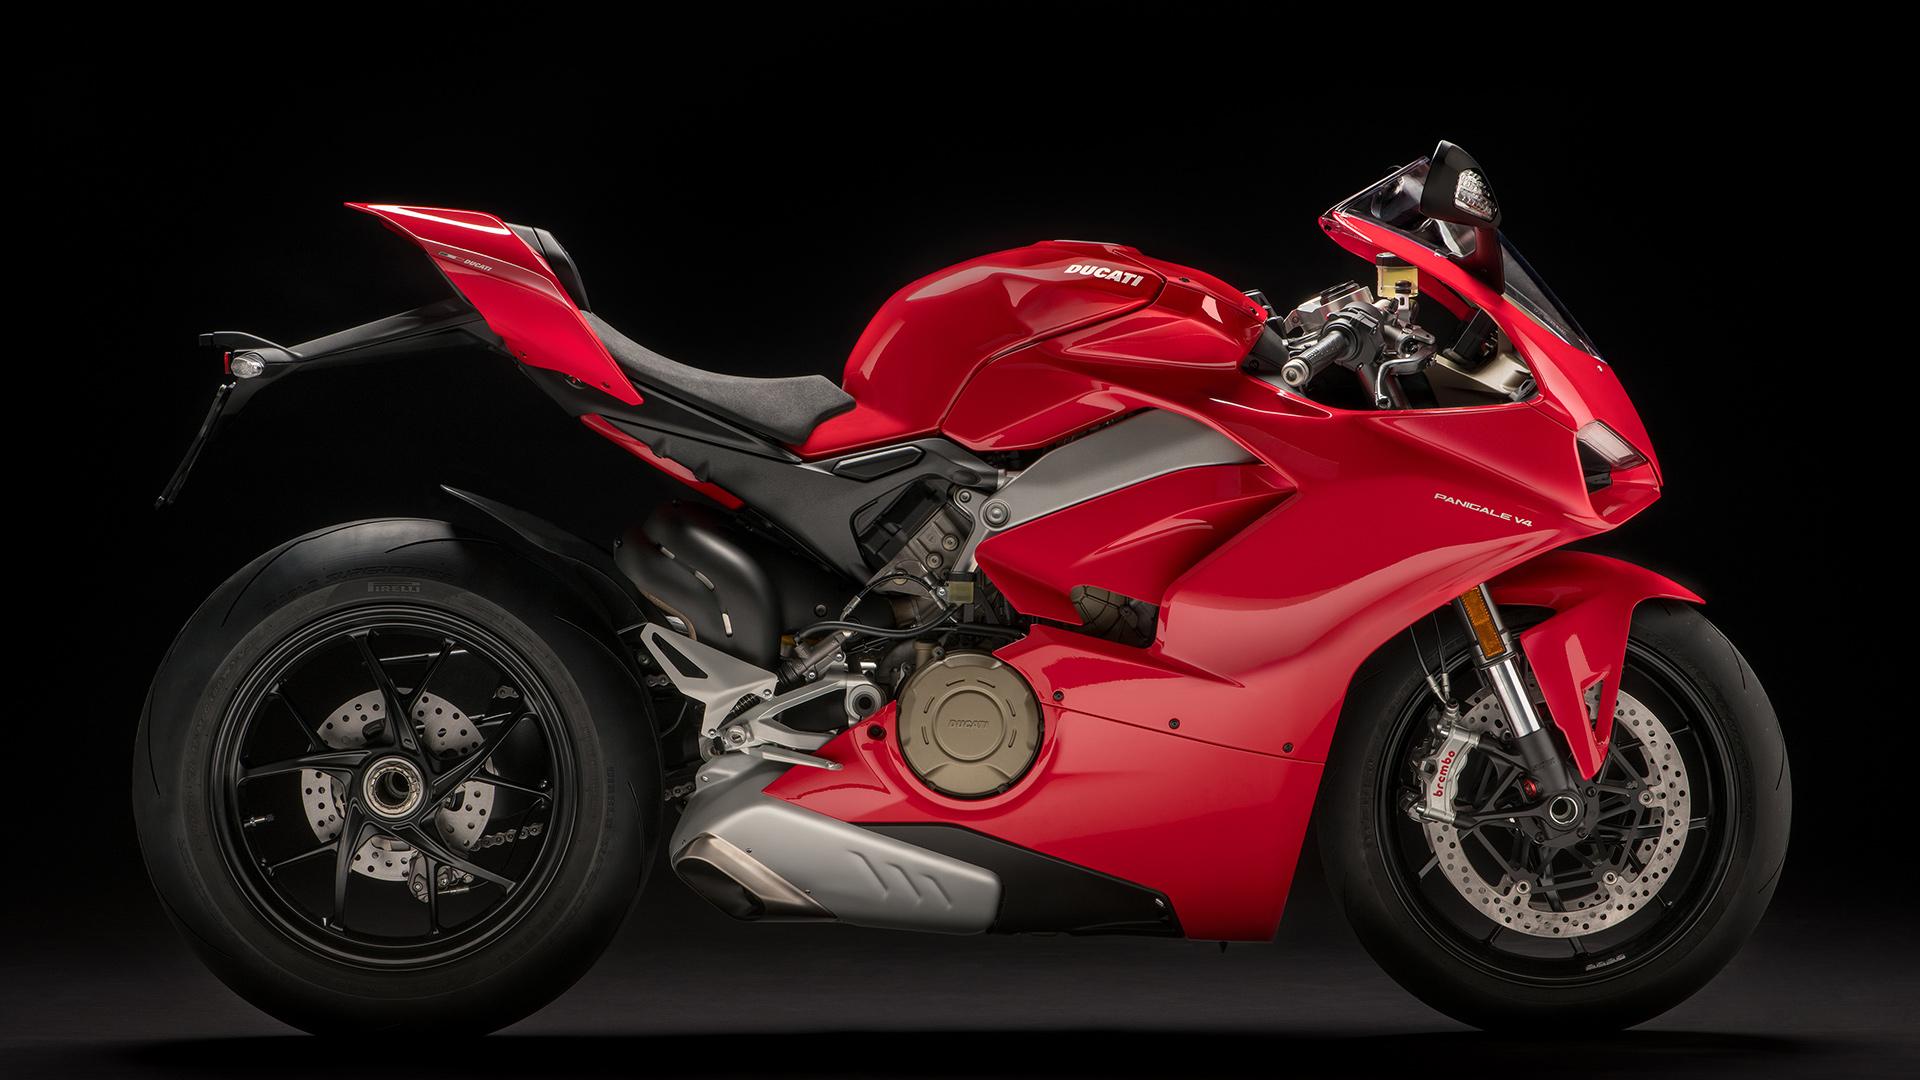 Ducati Panigale V4 - 2018 - side / profil